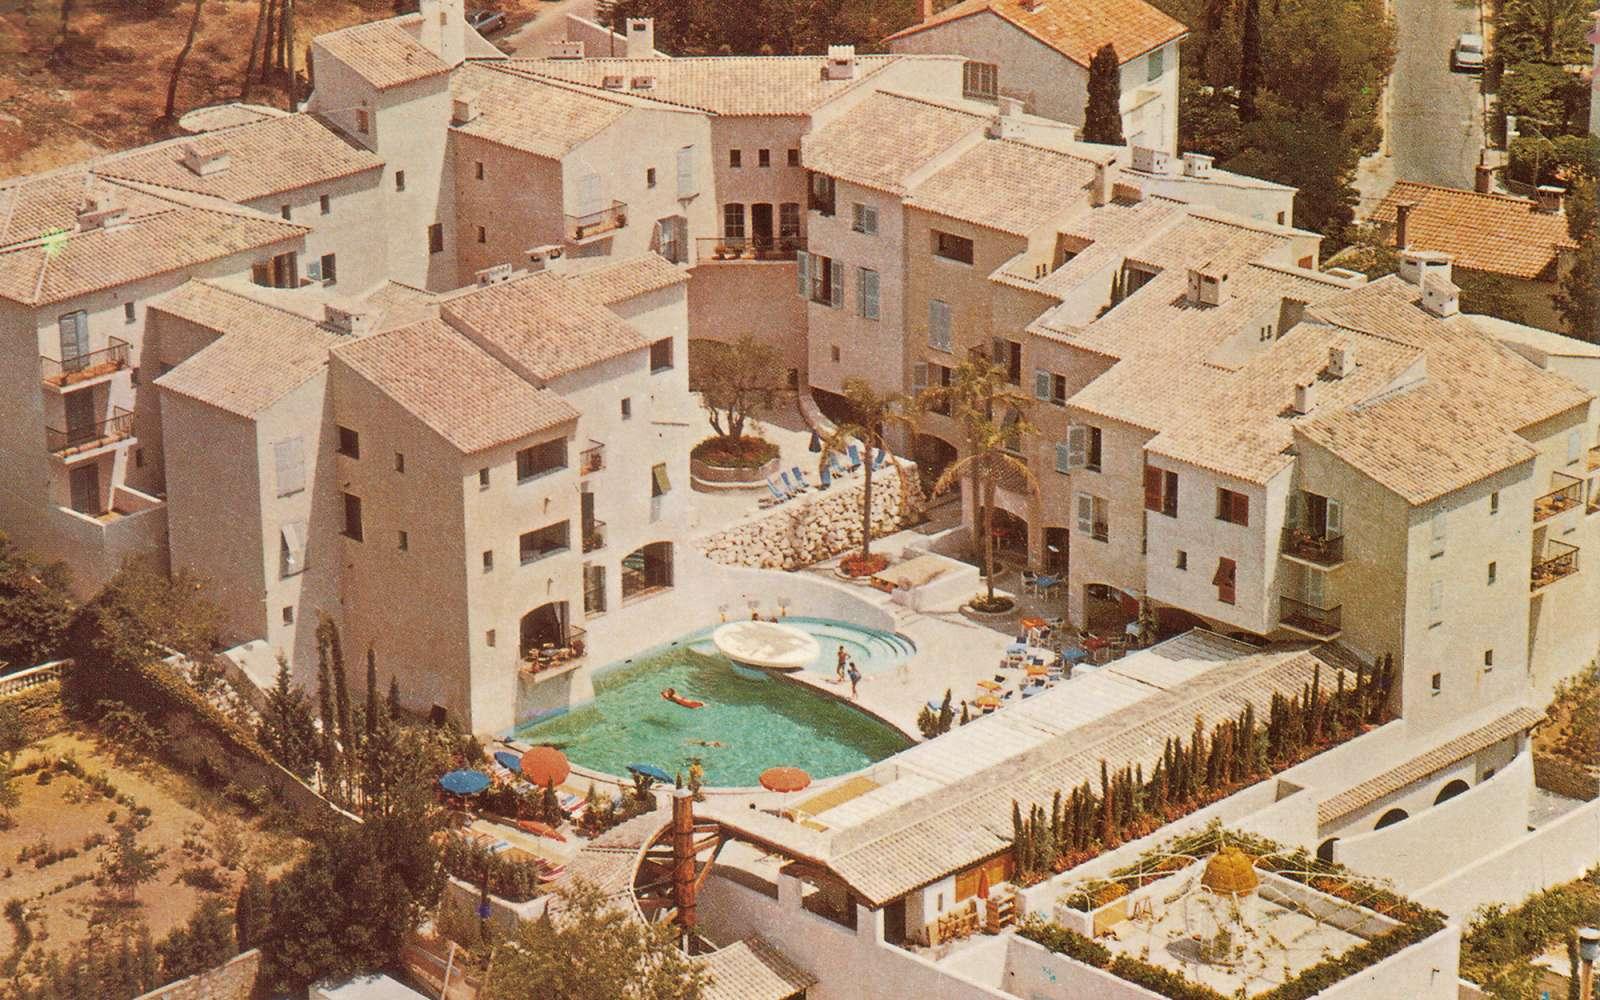 Hotel Palace Saint Tropez